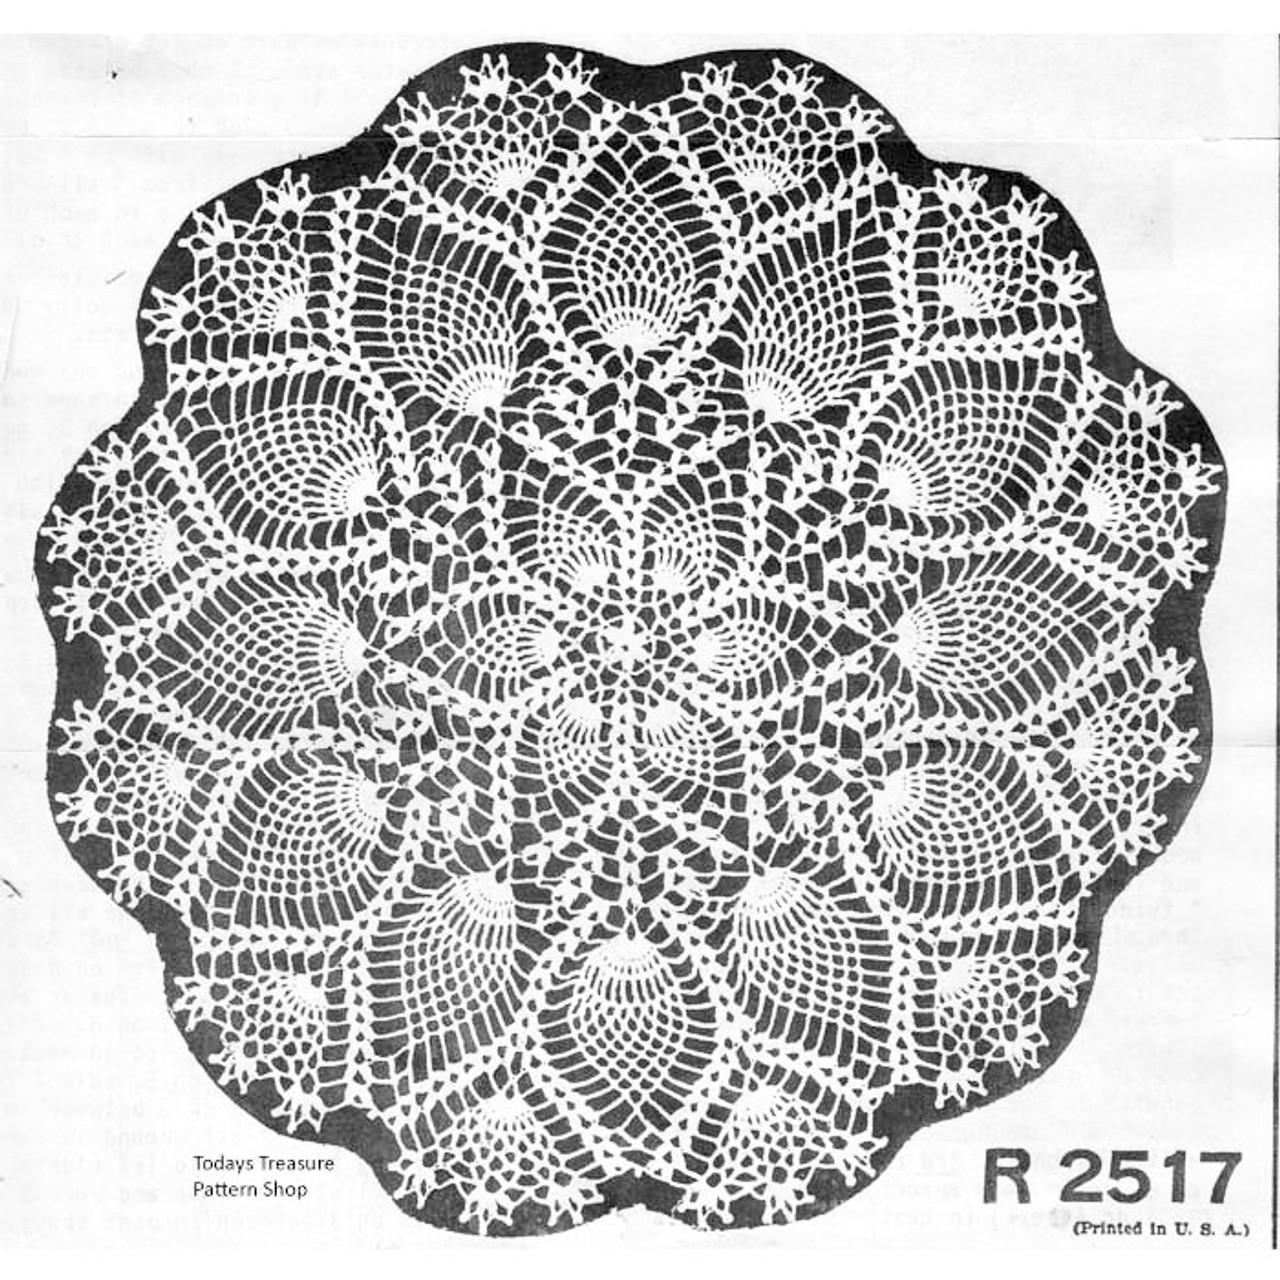 Vintage Pineapple Doily, Shell Border Pattern No R-2517